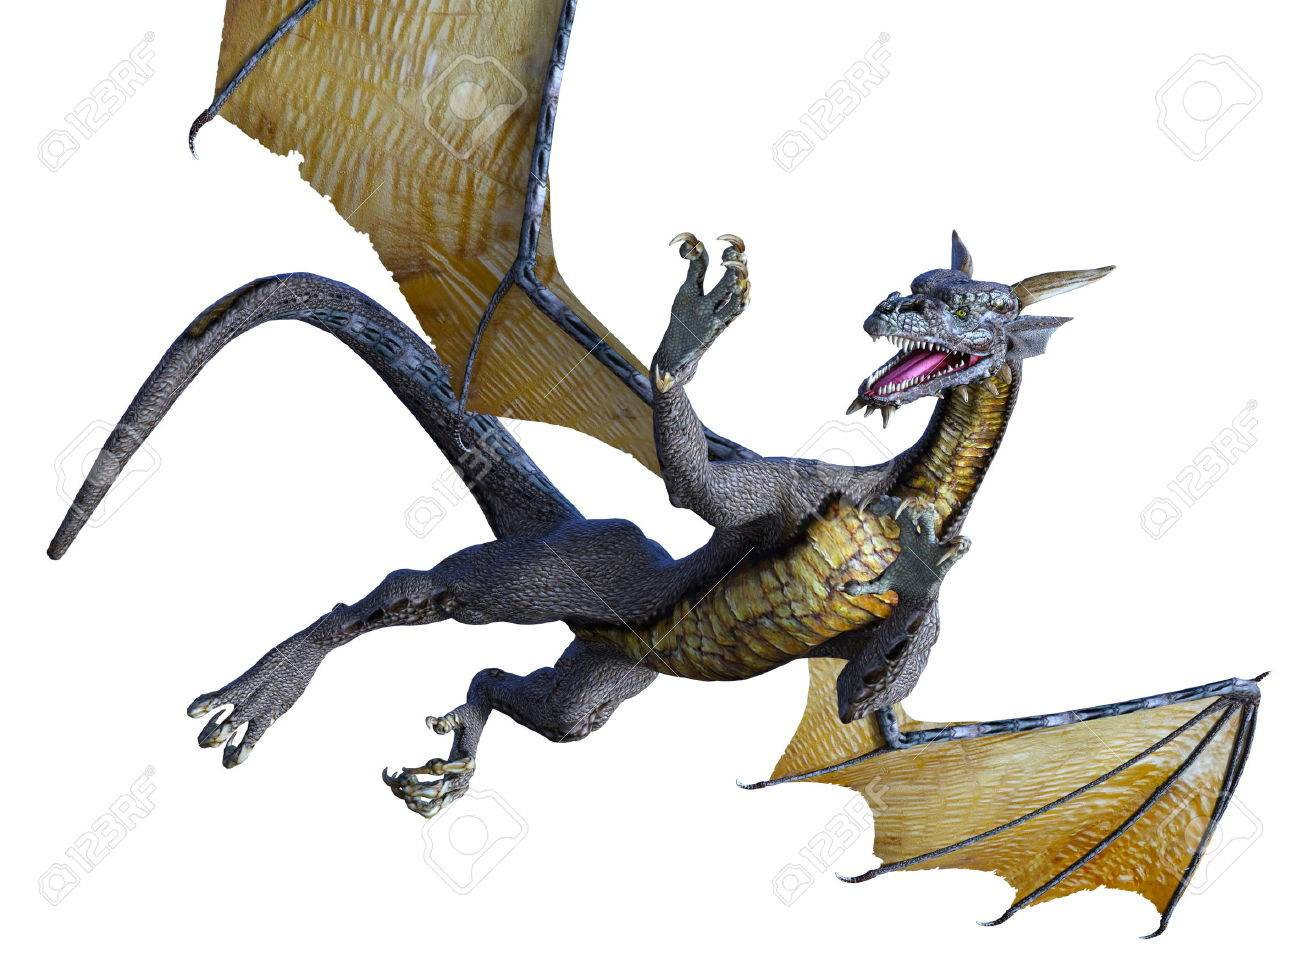 dragon - 47066538